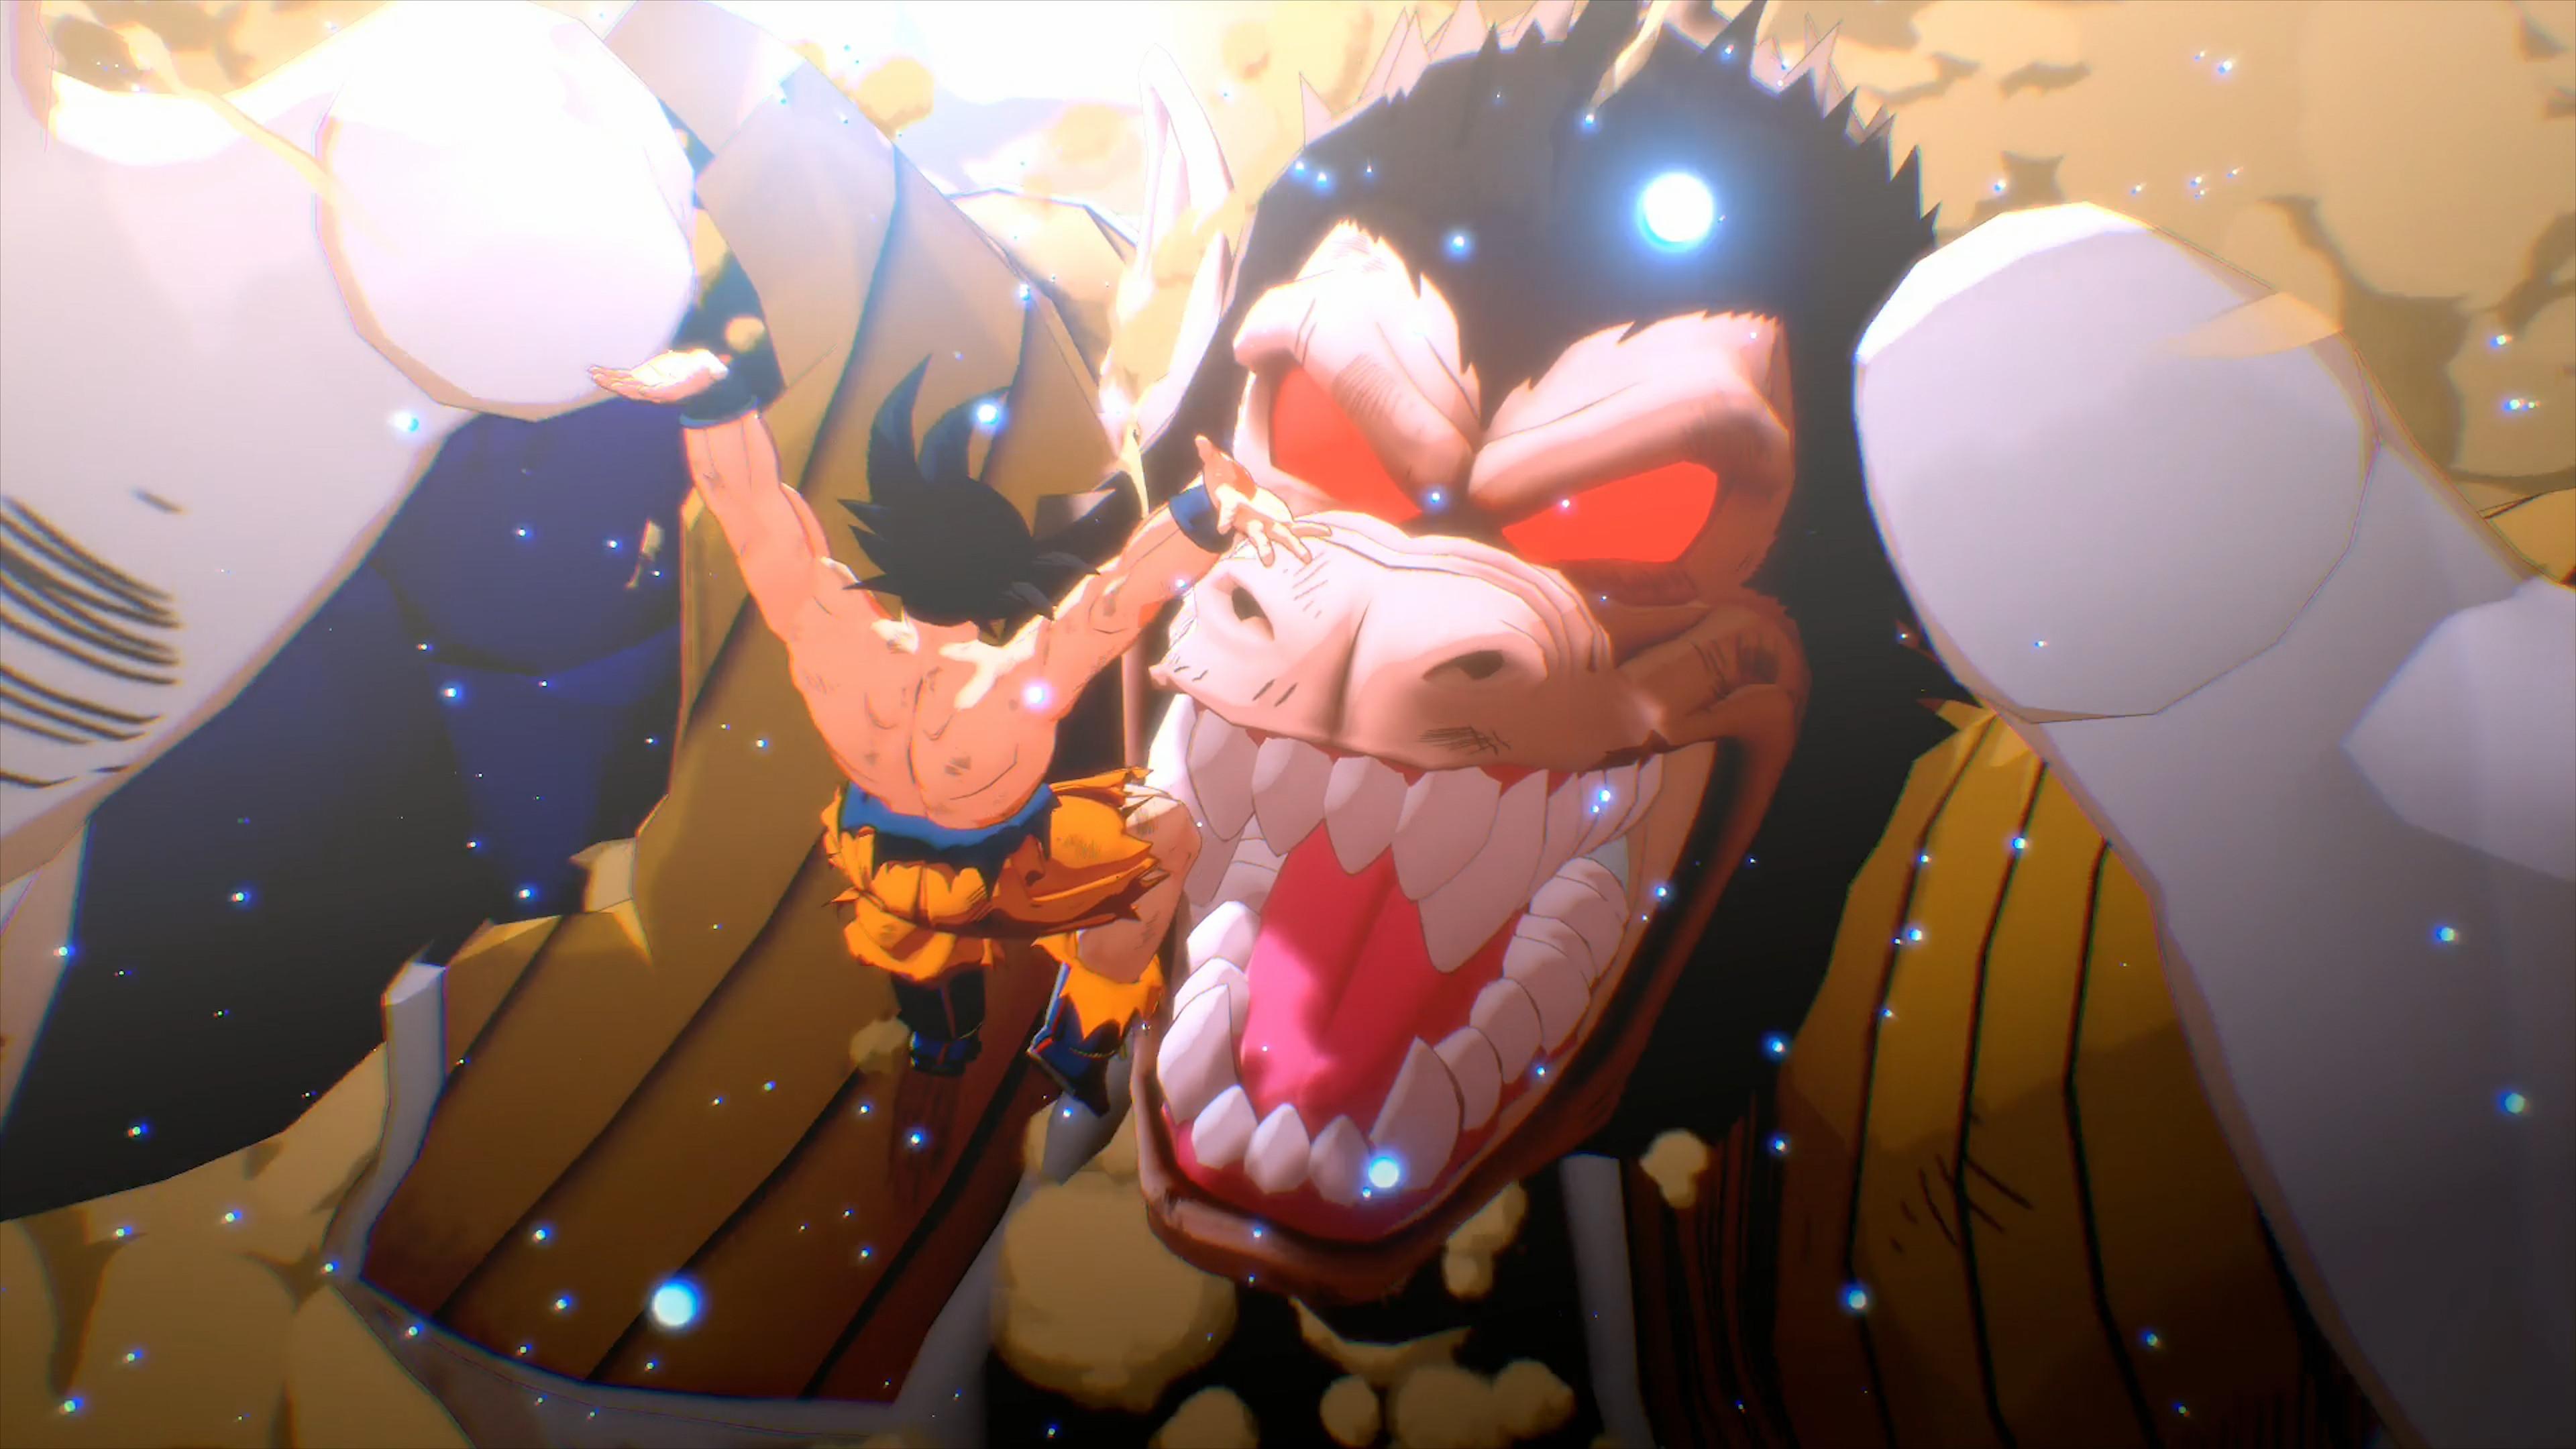 Pre-Orders For Dragon Ball Z: Kakarot Have Begun, Full Game Set To Release On January 17